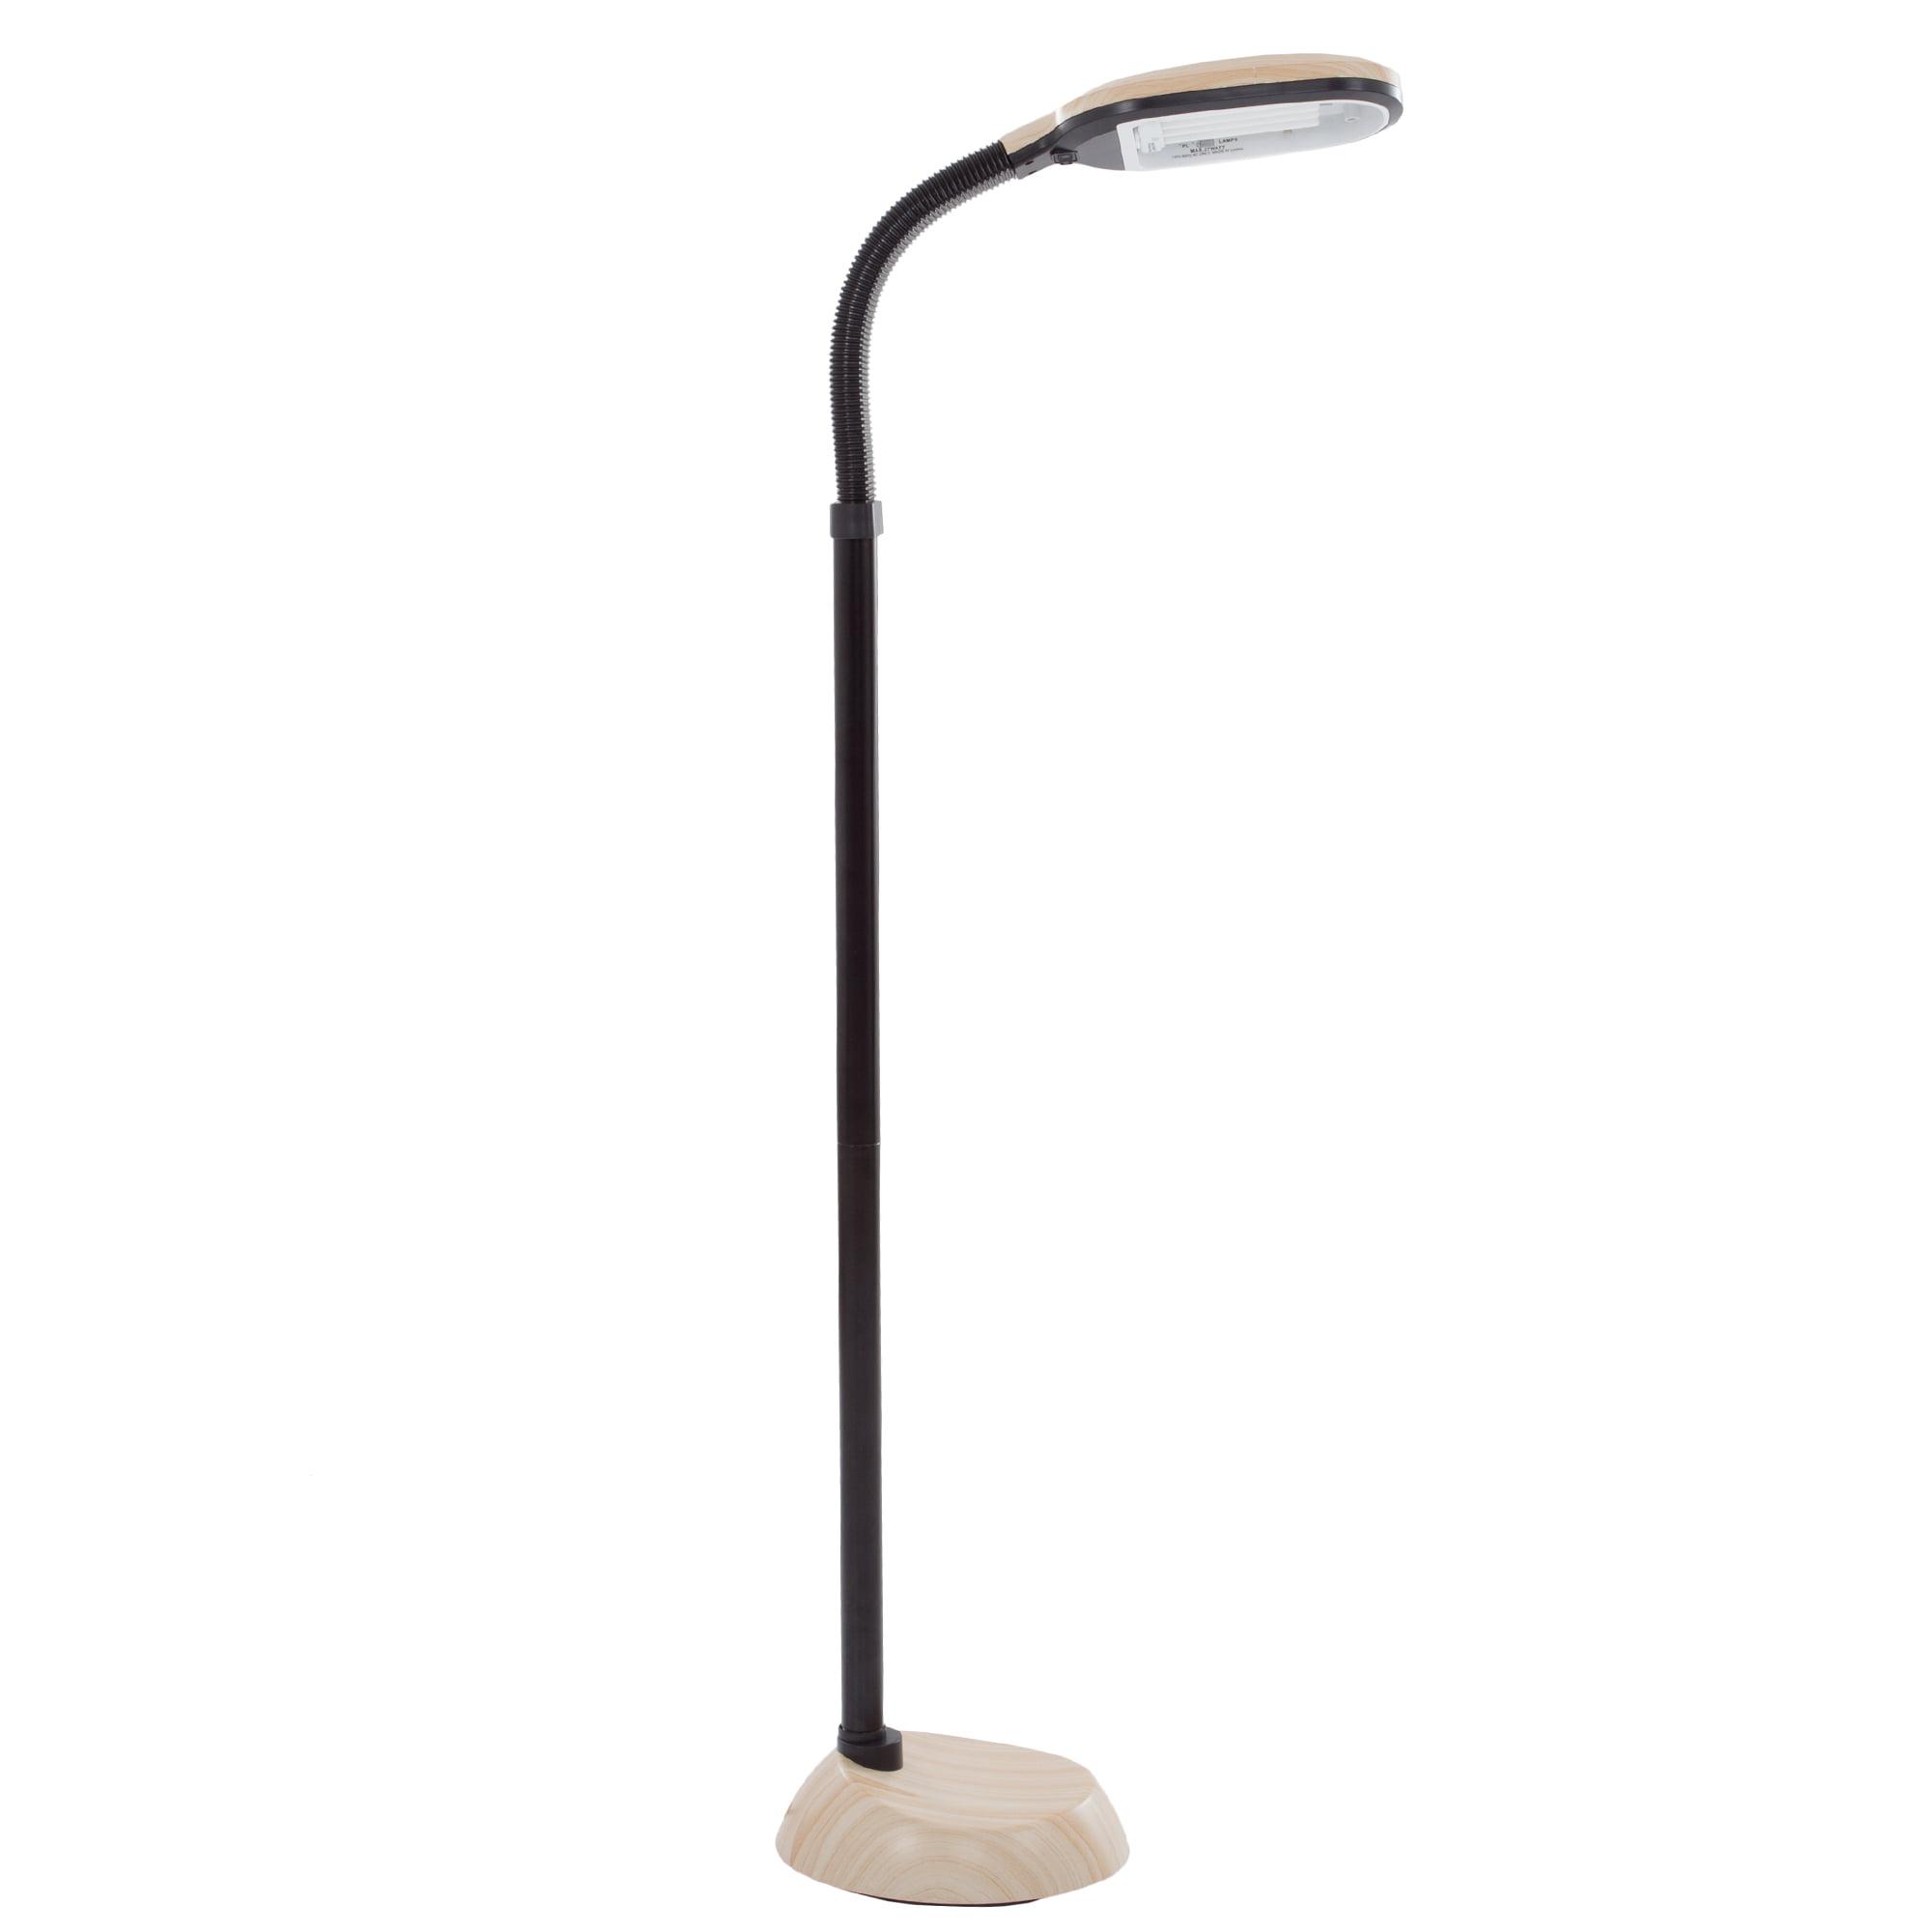 Lavish Home Light Wood Grain Sunlight 5' Floor Lamp